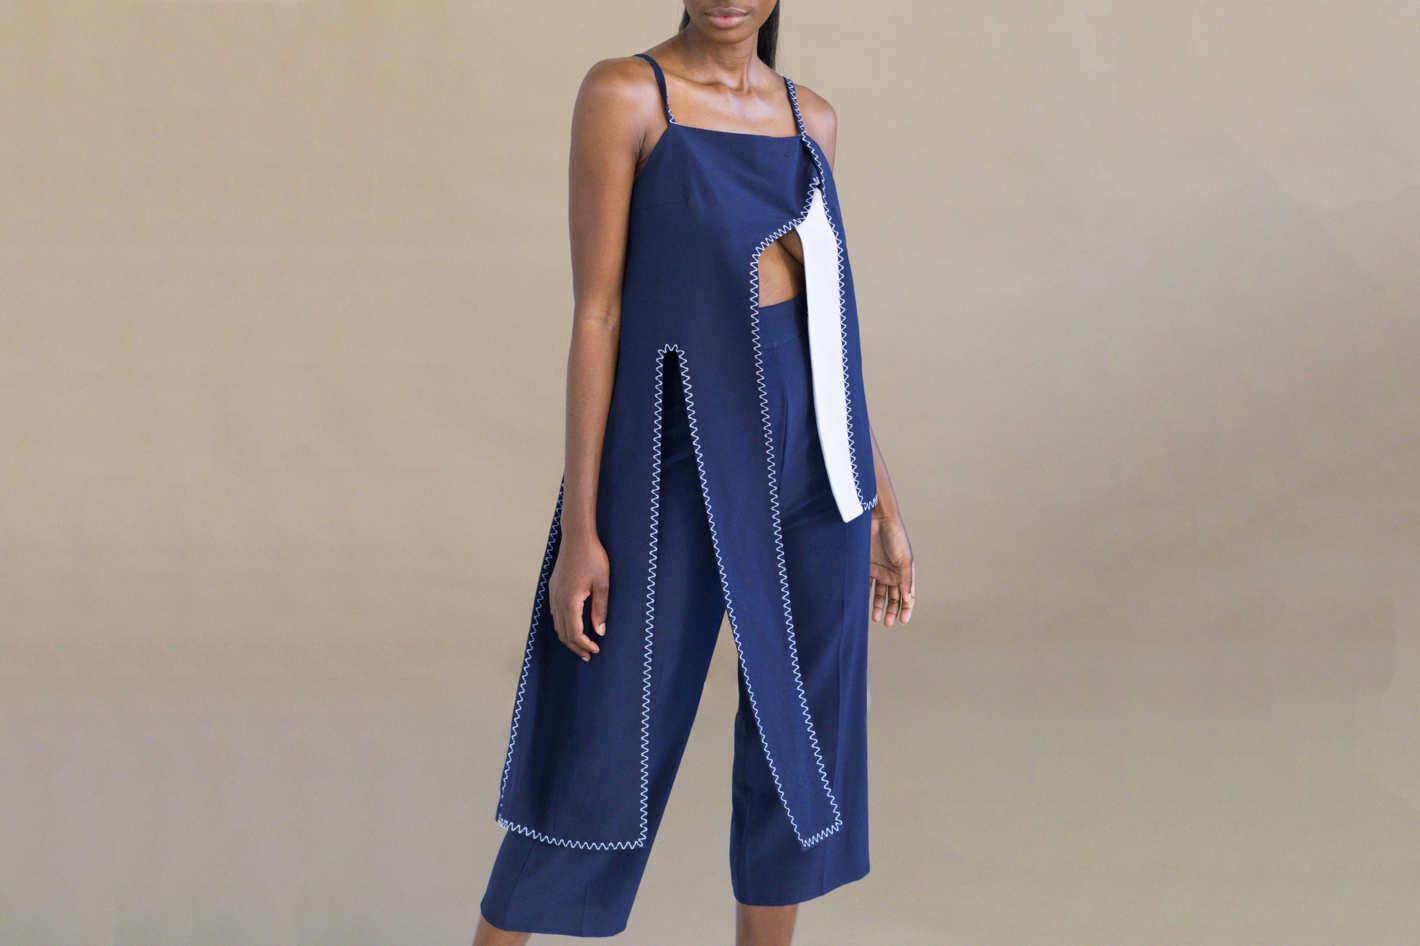 MmusoMaxwell Asymmetrical Camisole Top